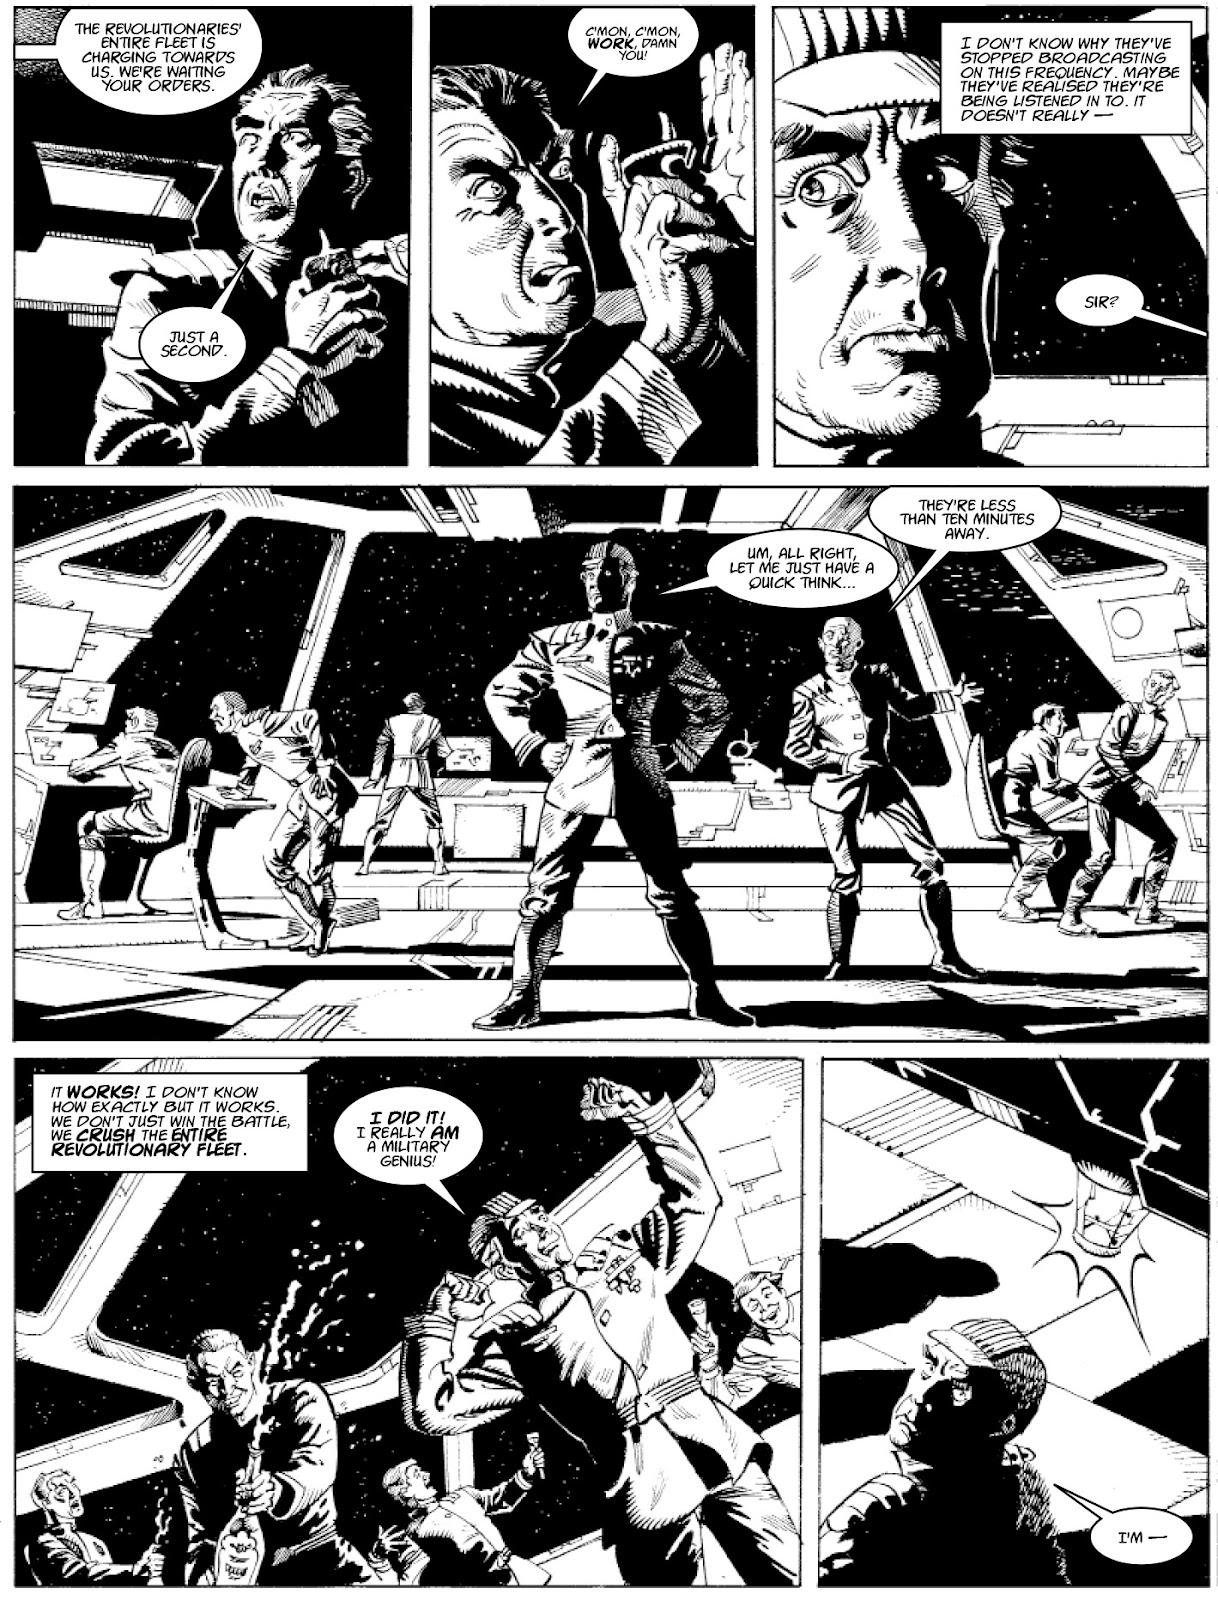 Judge Dredd Megazine (Vol. 5) issue 427 - Page 117